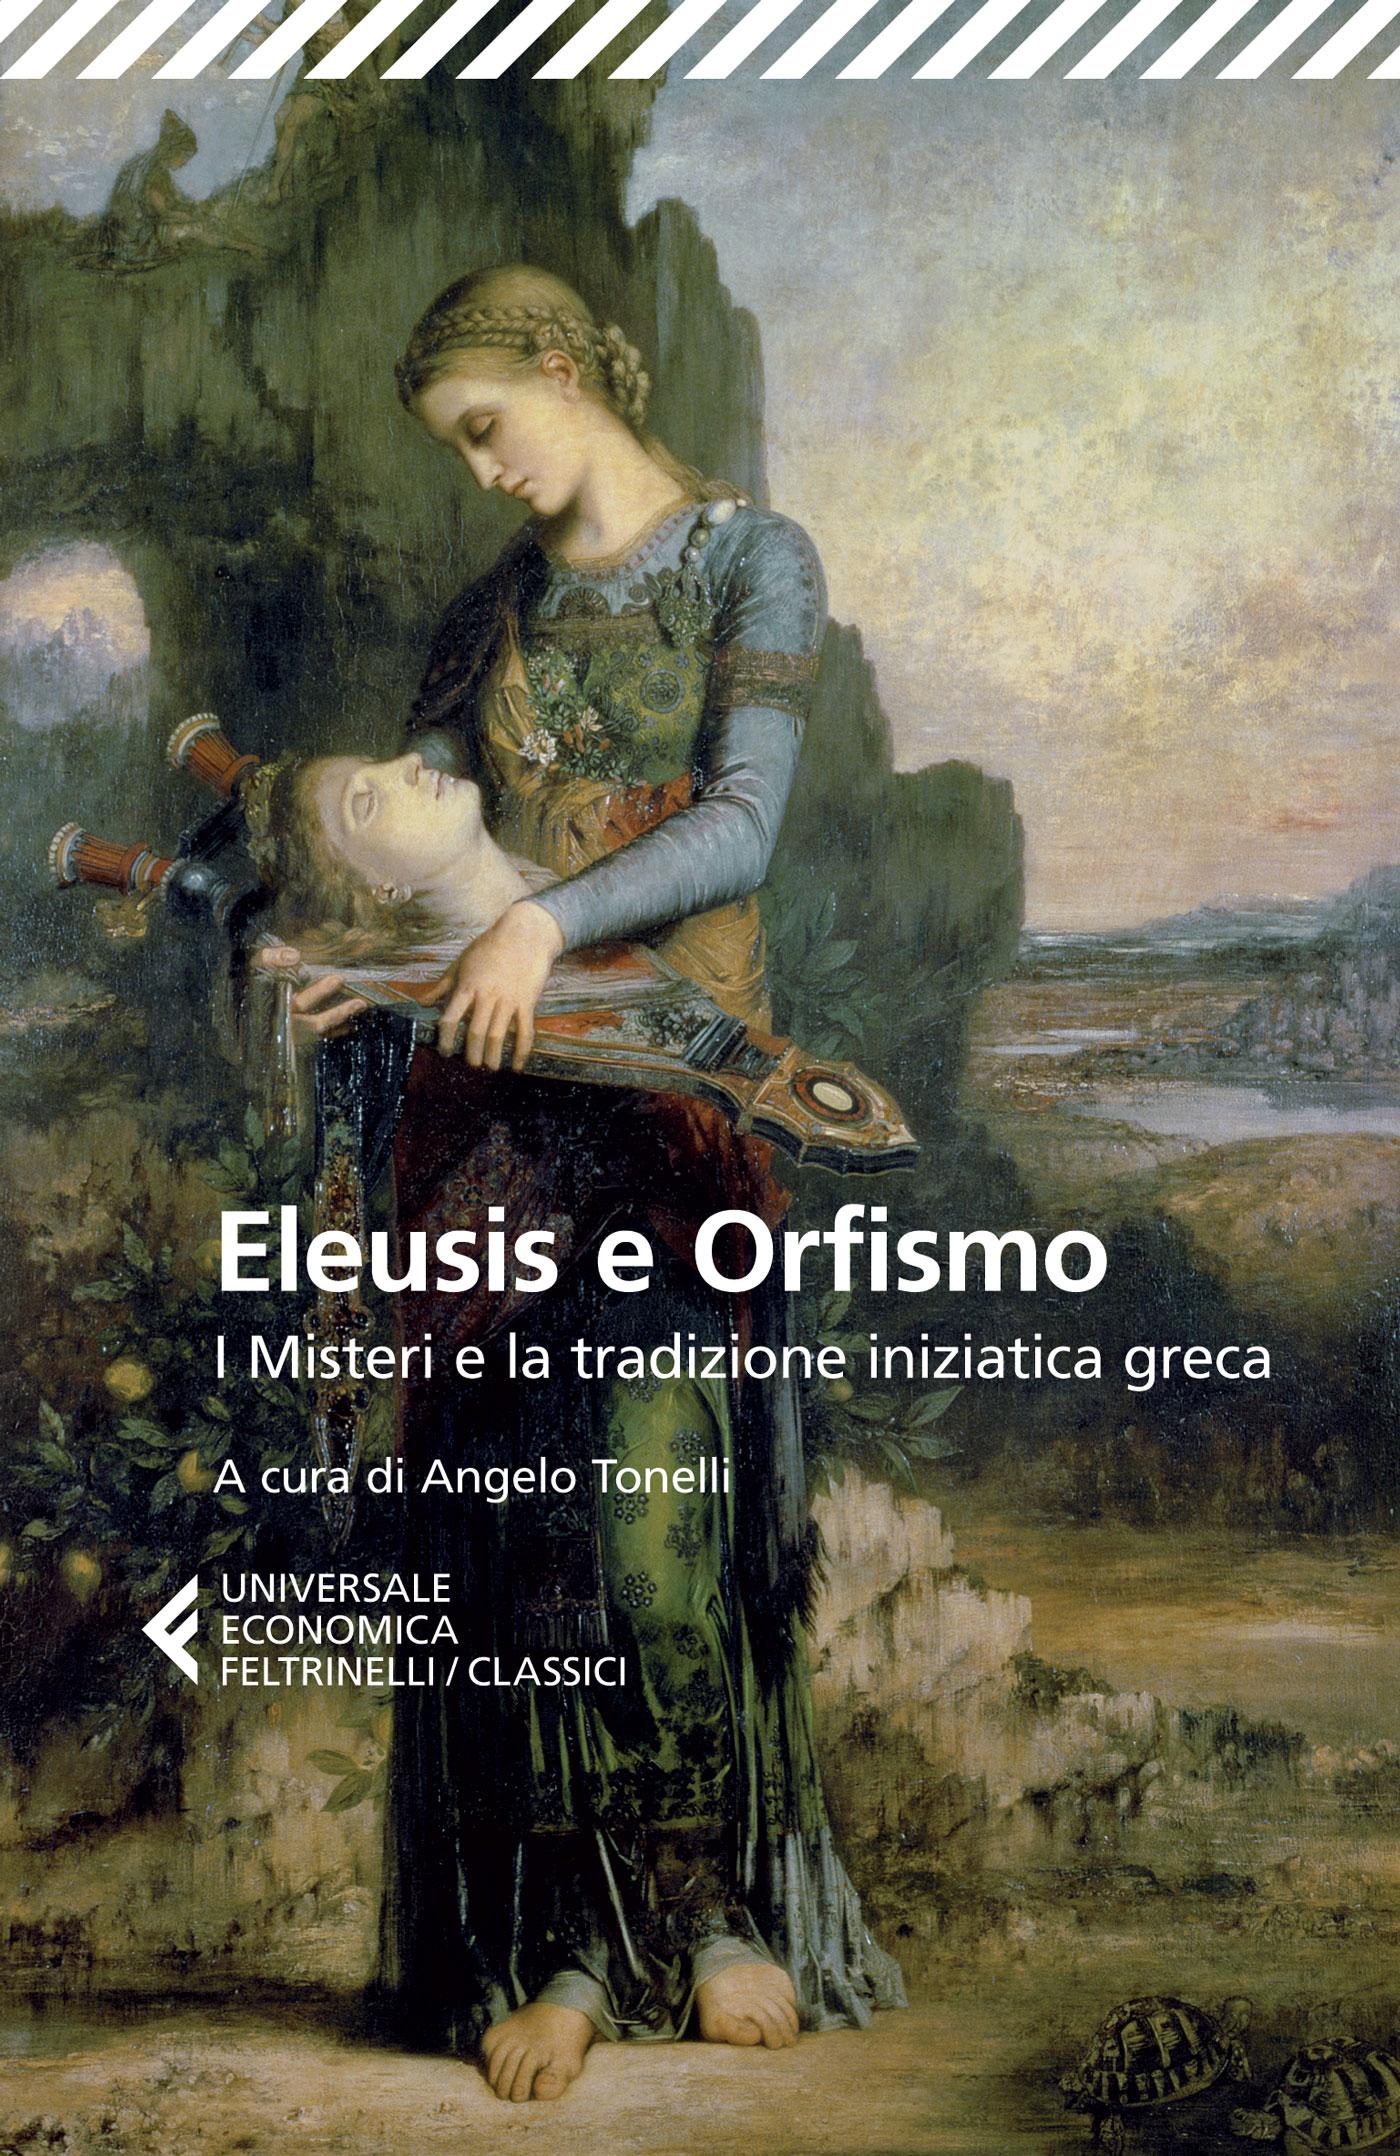 Eleusis e Orfismo